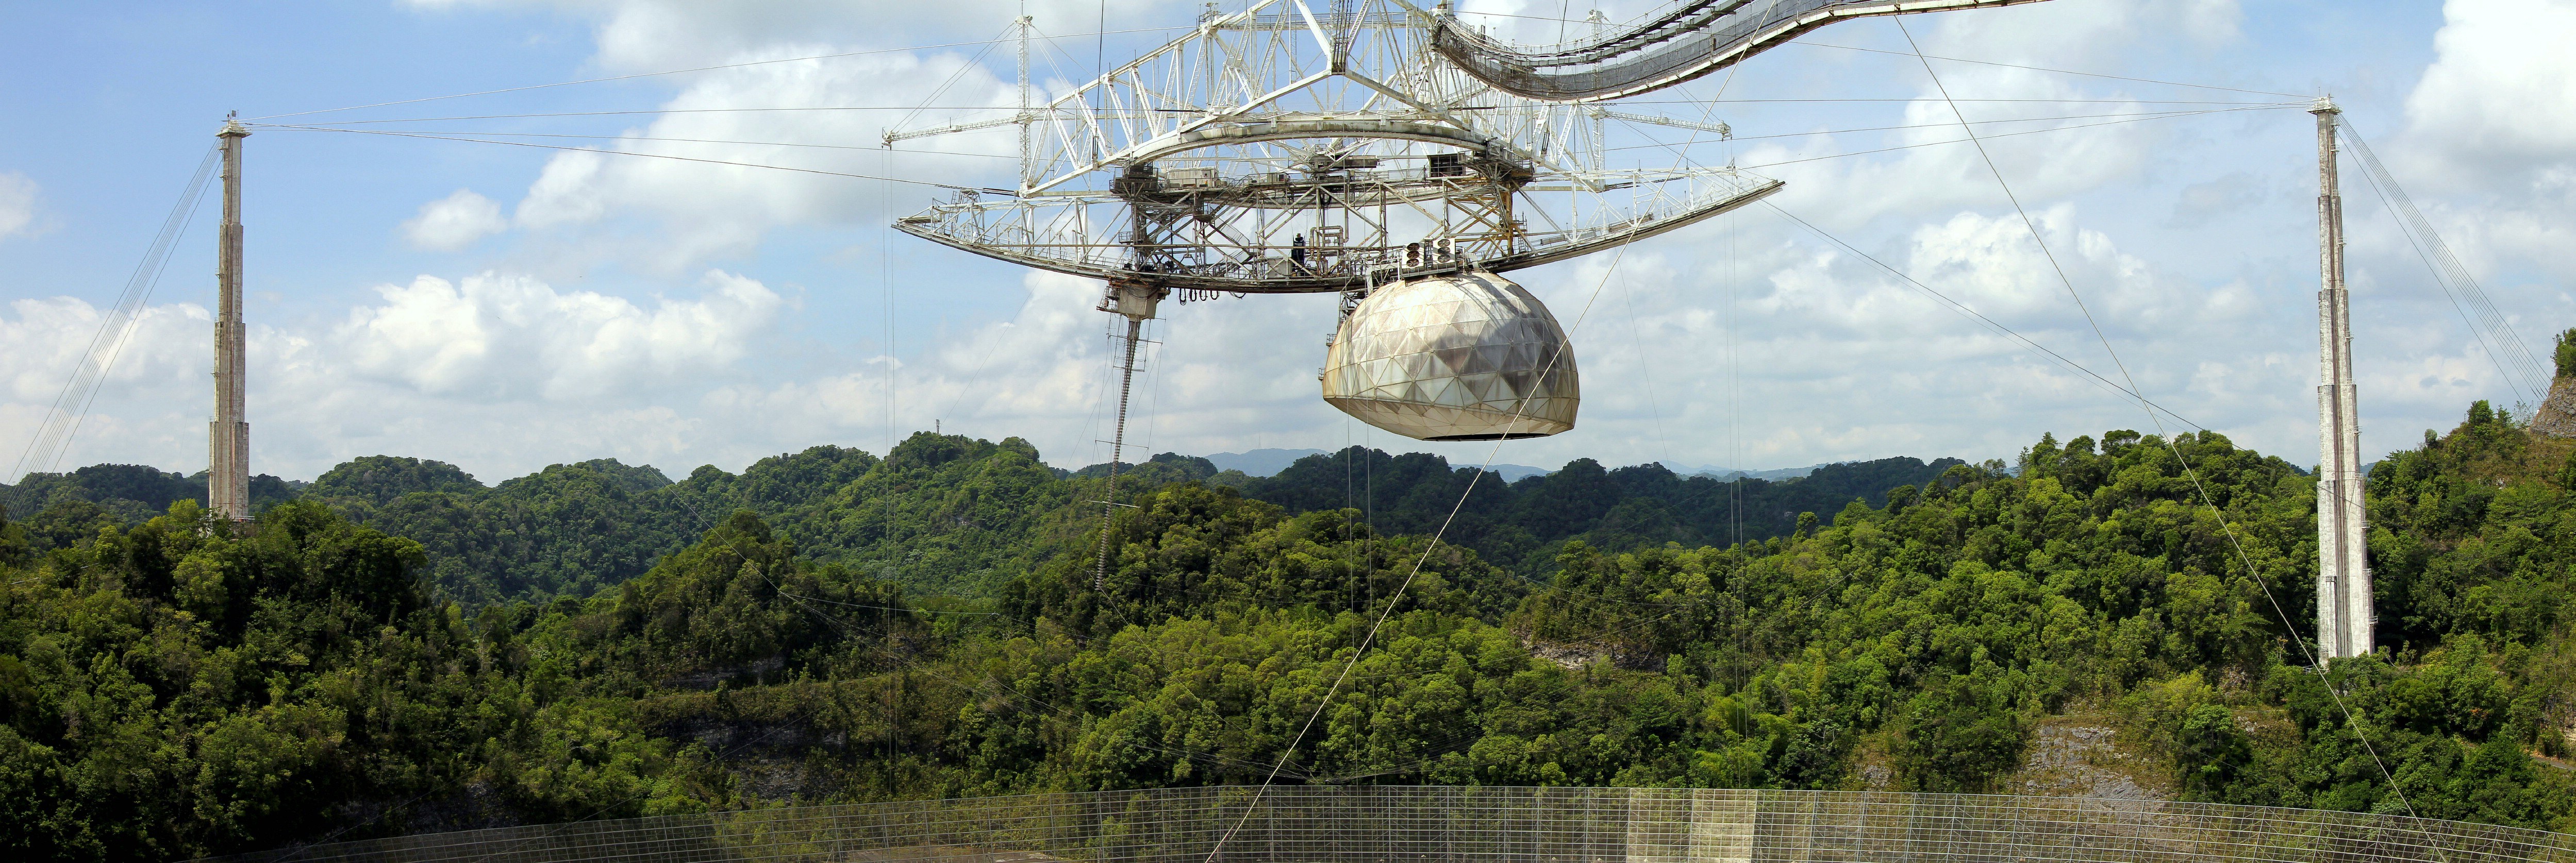 Arecibo Observatory, Arecibo, Puerto Rico, Greater Antilles. June 4, 2015.